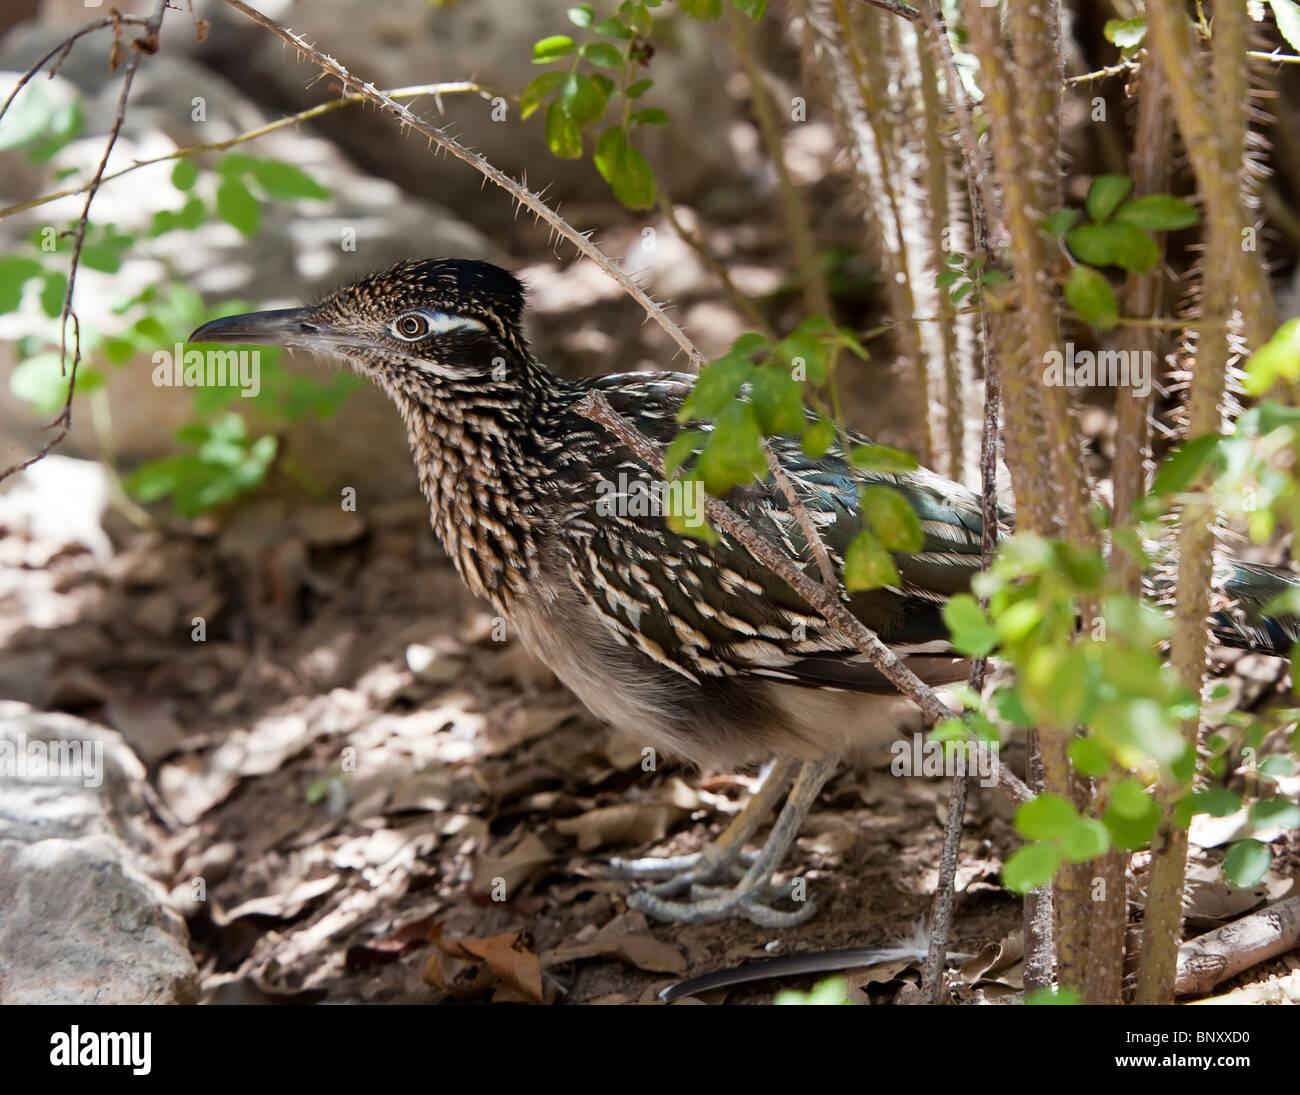 Greater Roadrunner Geococcyx californianus in undergrowth Texas USA - Stock Image